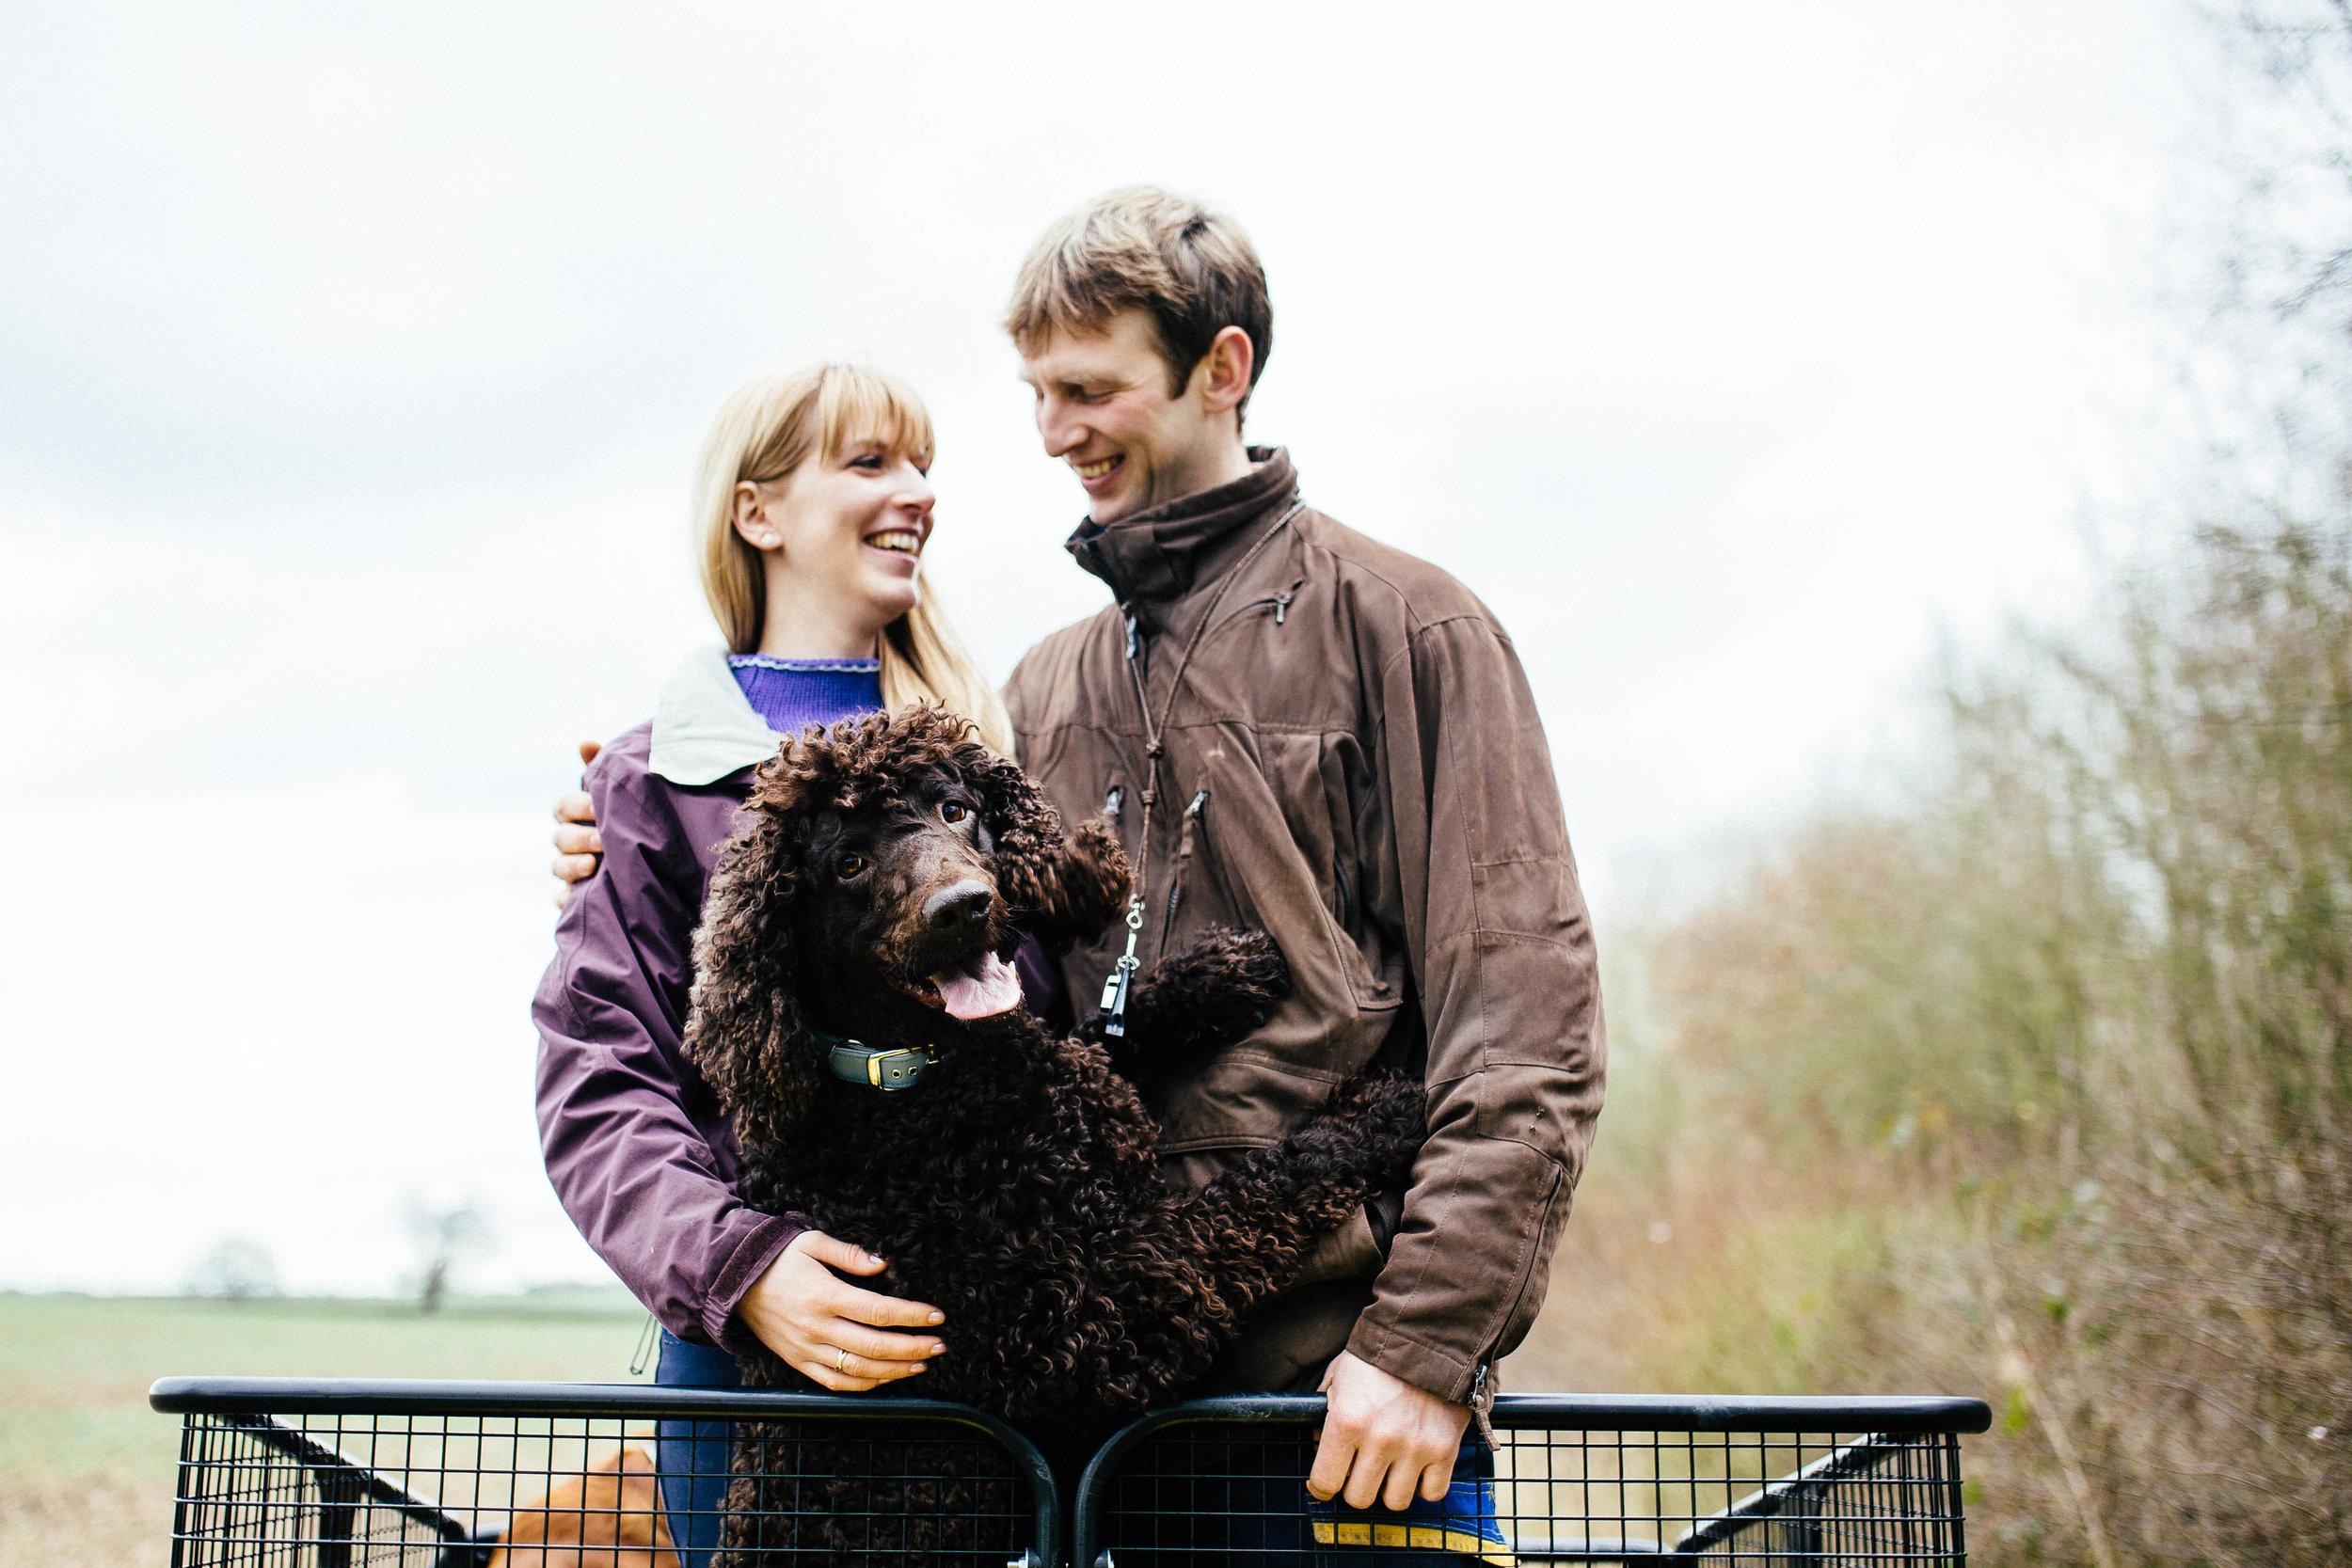 HORSE FARM FAMILY DOG PHOTOSHOOT 00012.JPG